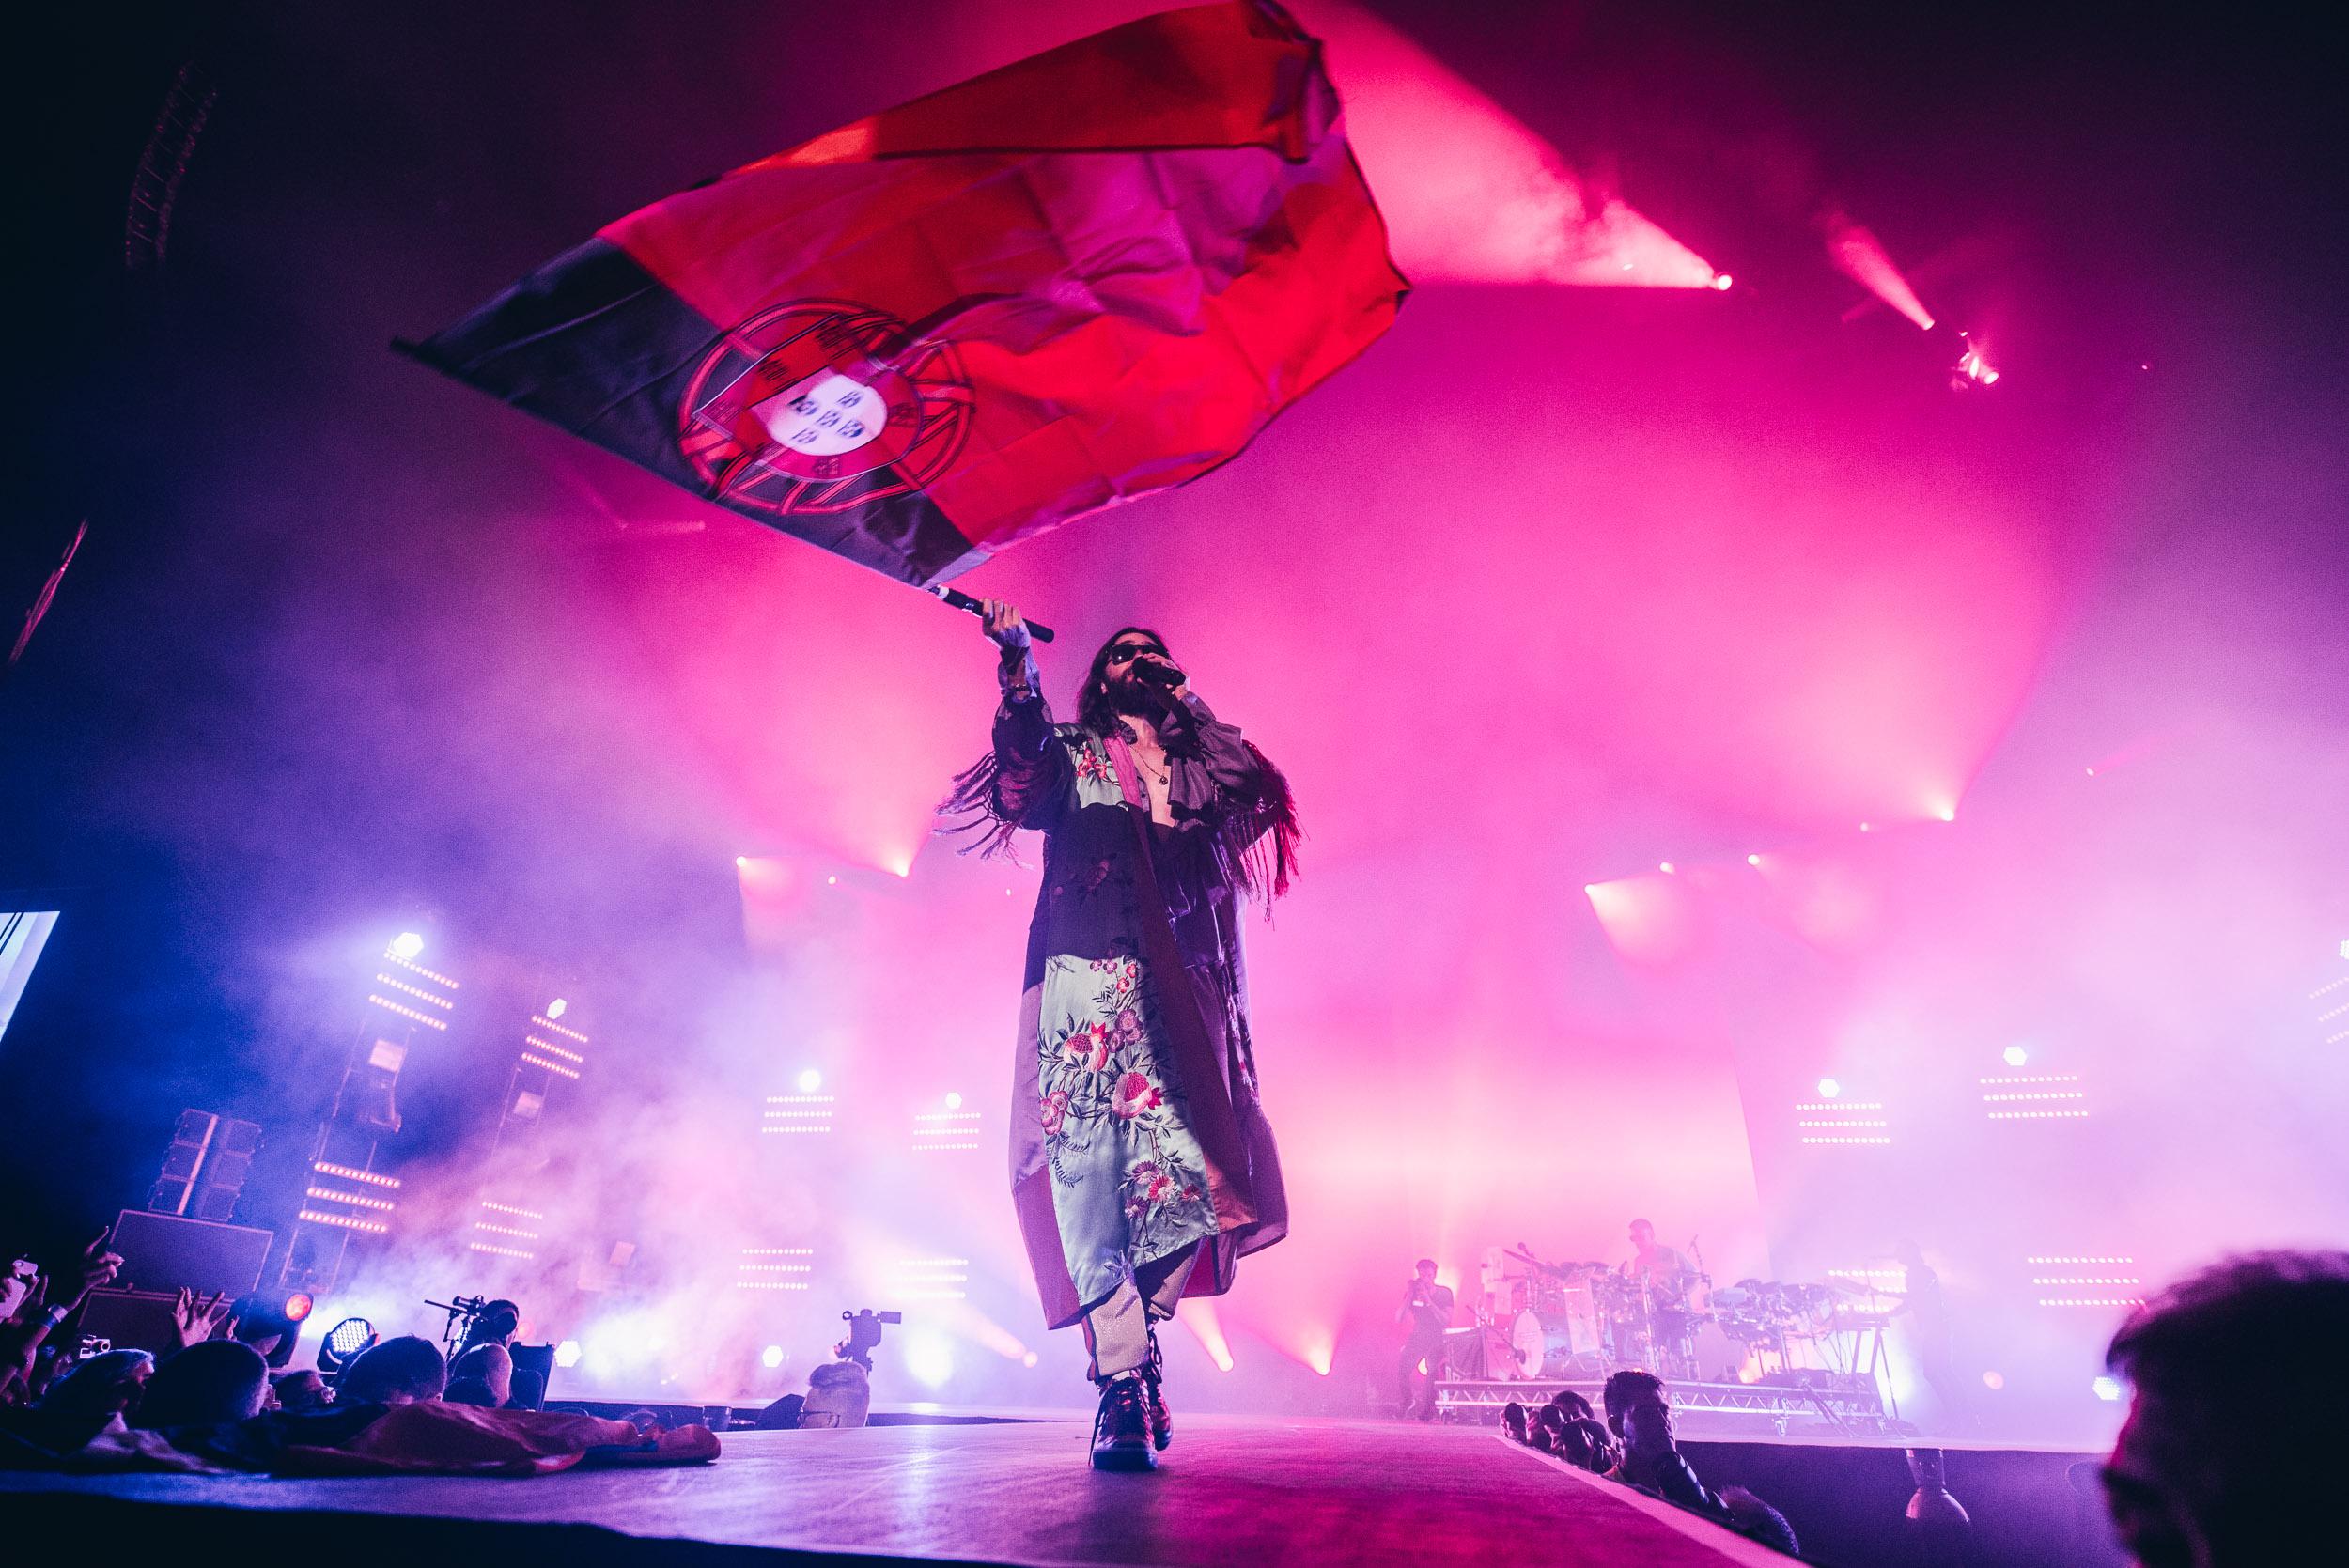 30 Seconds to Mars Altice Arena 20180912-533.jpg